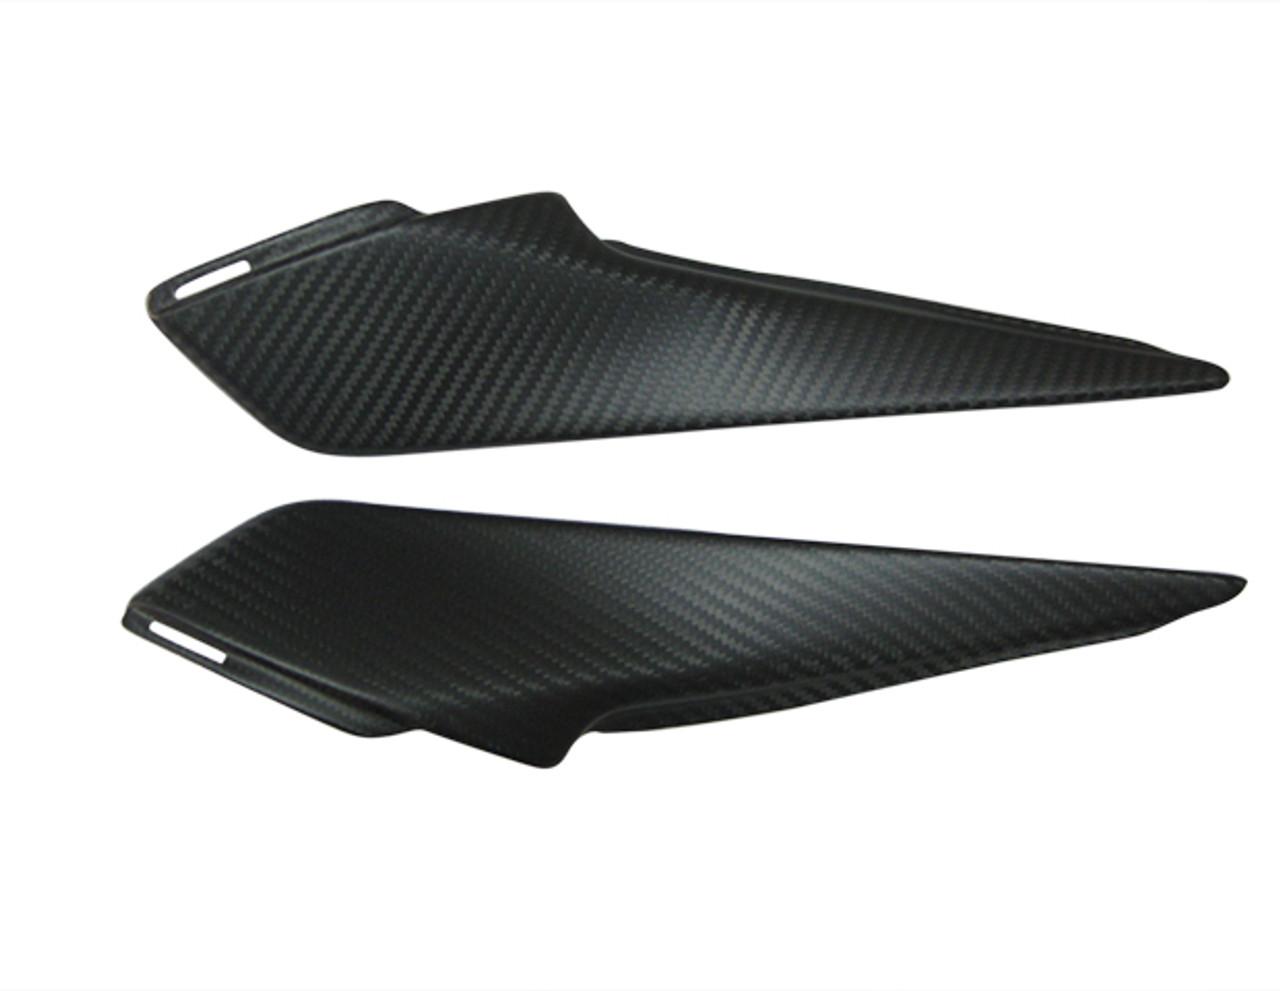 Matte Twill Weave Carbon Fiber Small Side Panels for Honda CBR 1000RR 12-16